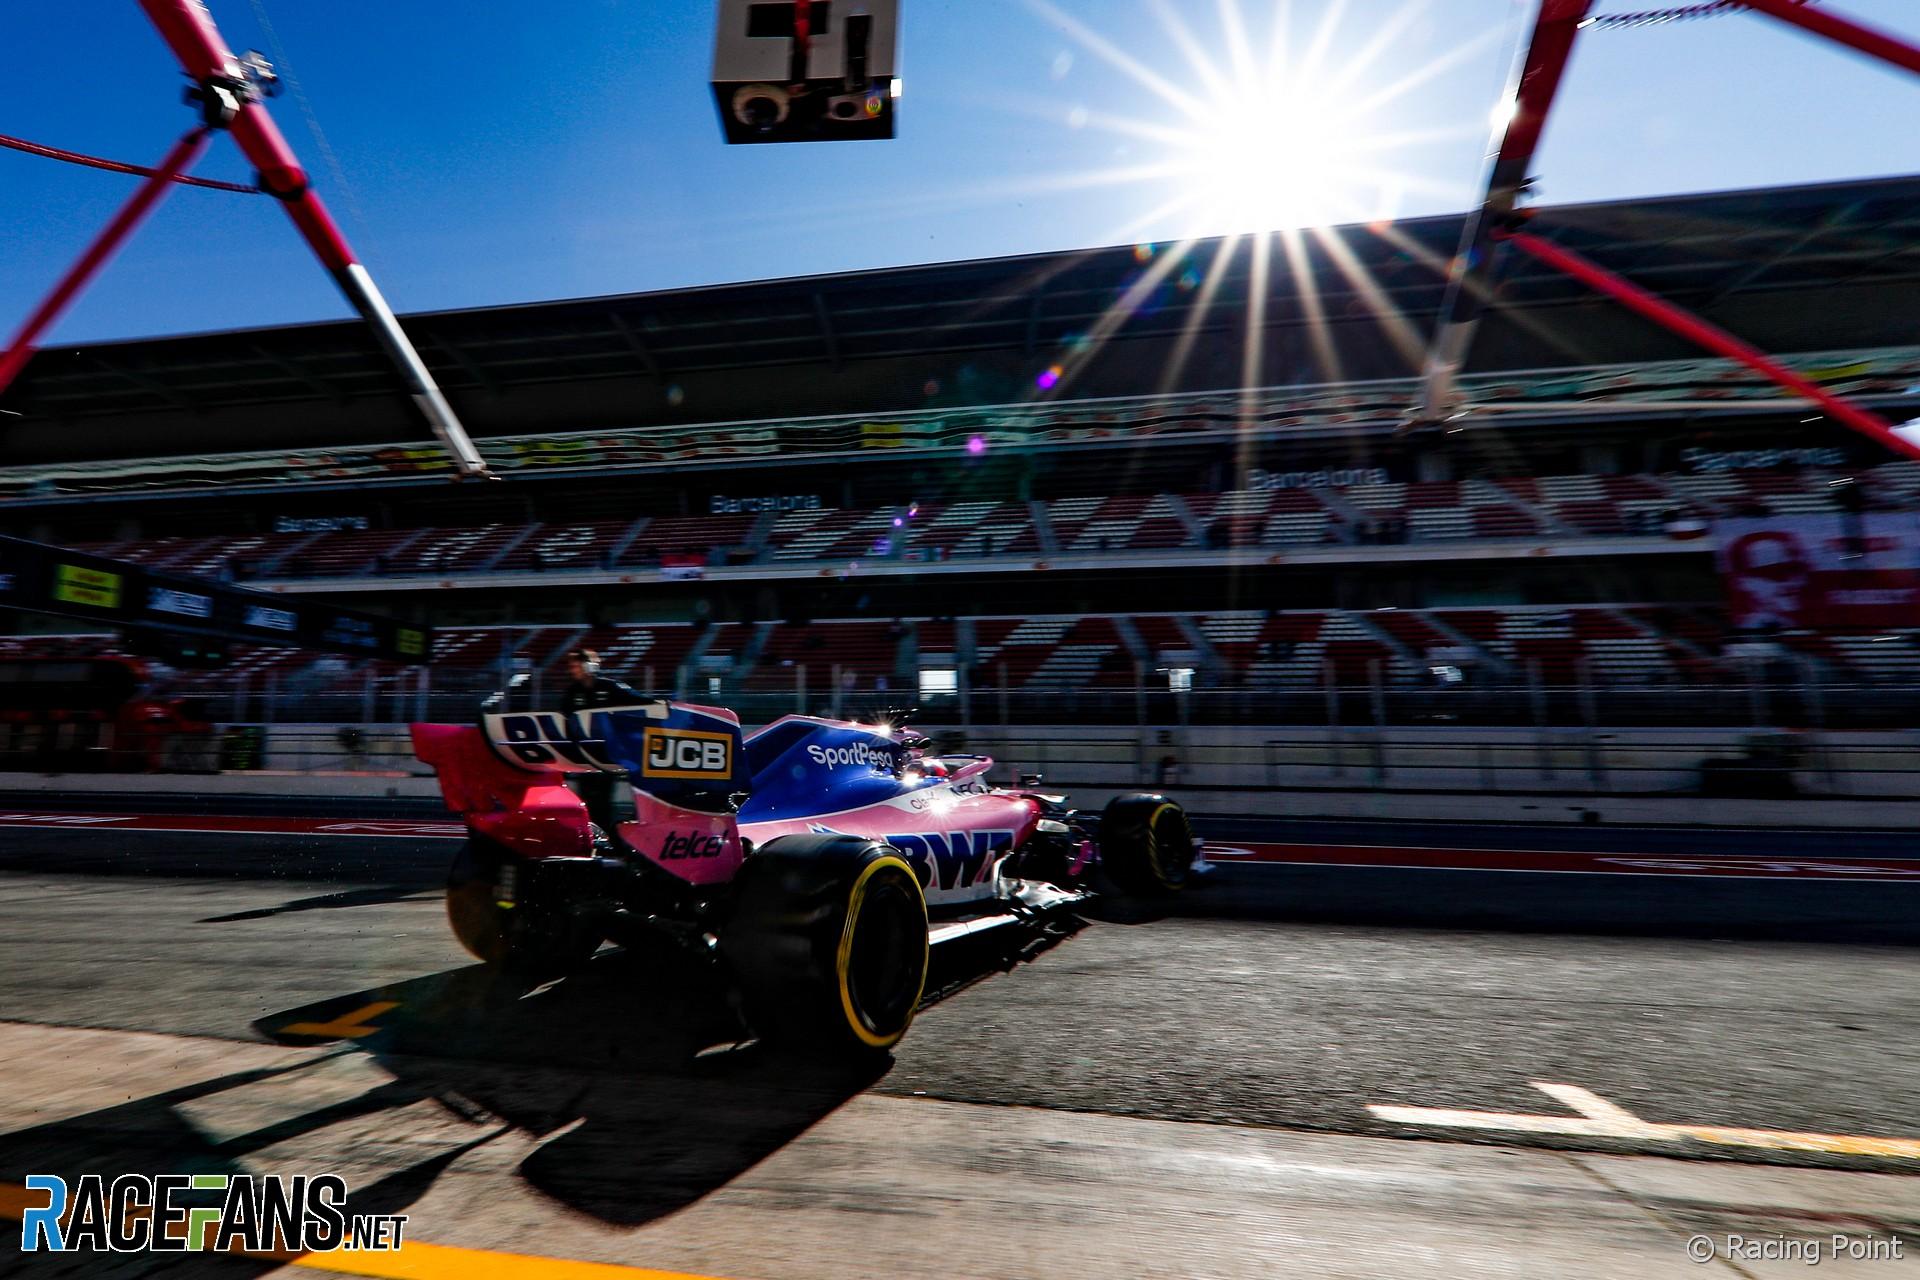 Sergio Perez, Racing Point, Circuit de Catalunya, 2019